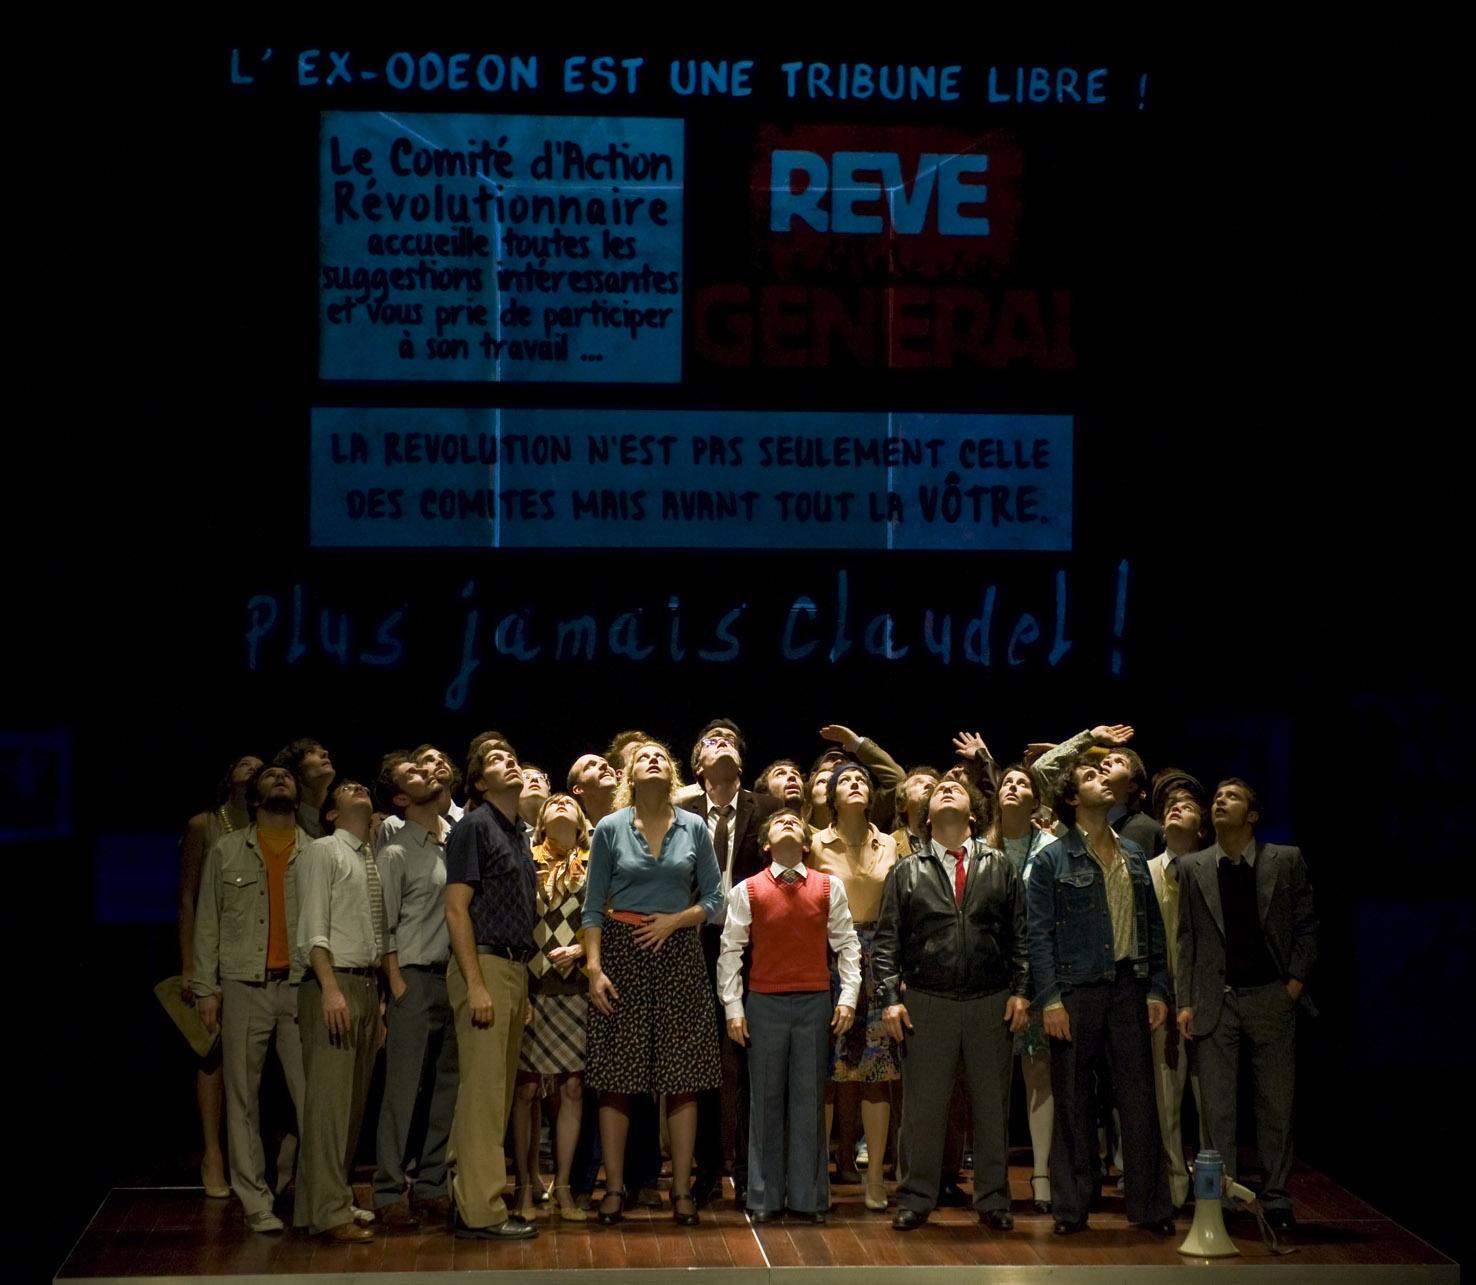 Mai, juin, juillet de Denis GuénounMise en scène Christian Sch